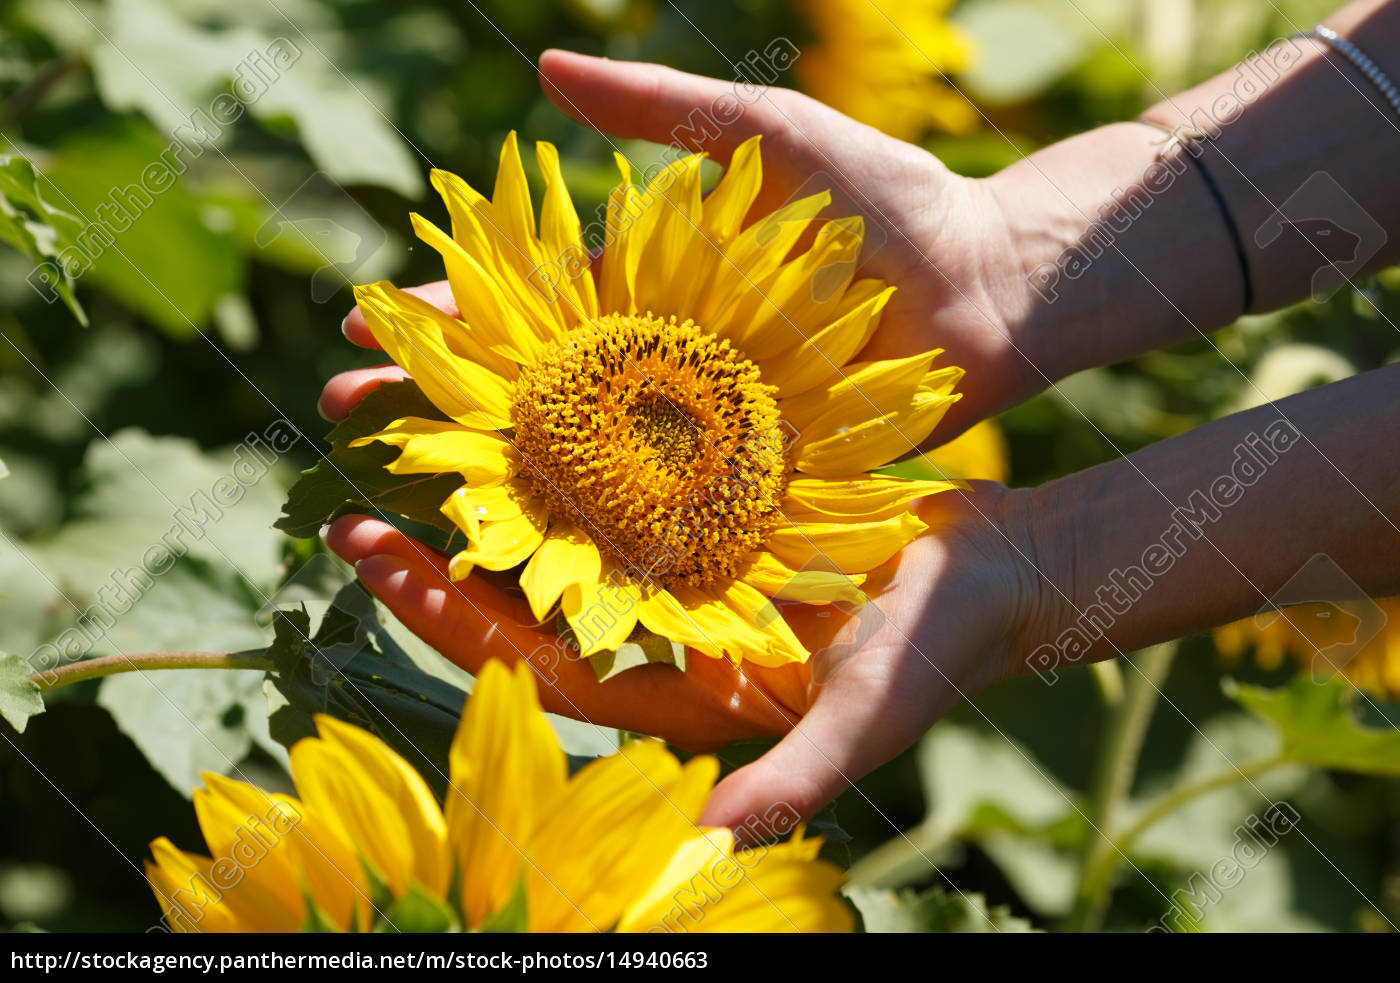 woman, holding, sunflower - 14940663